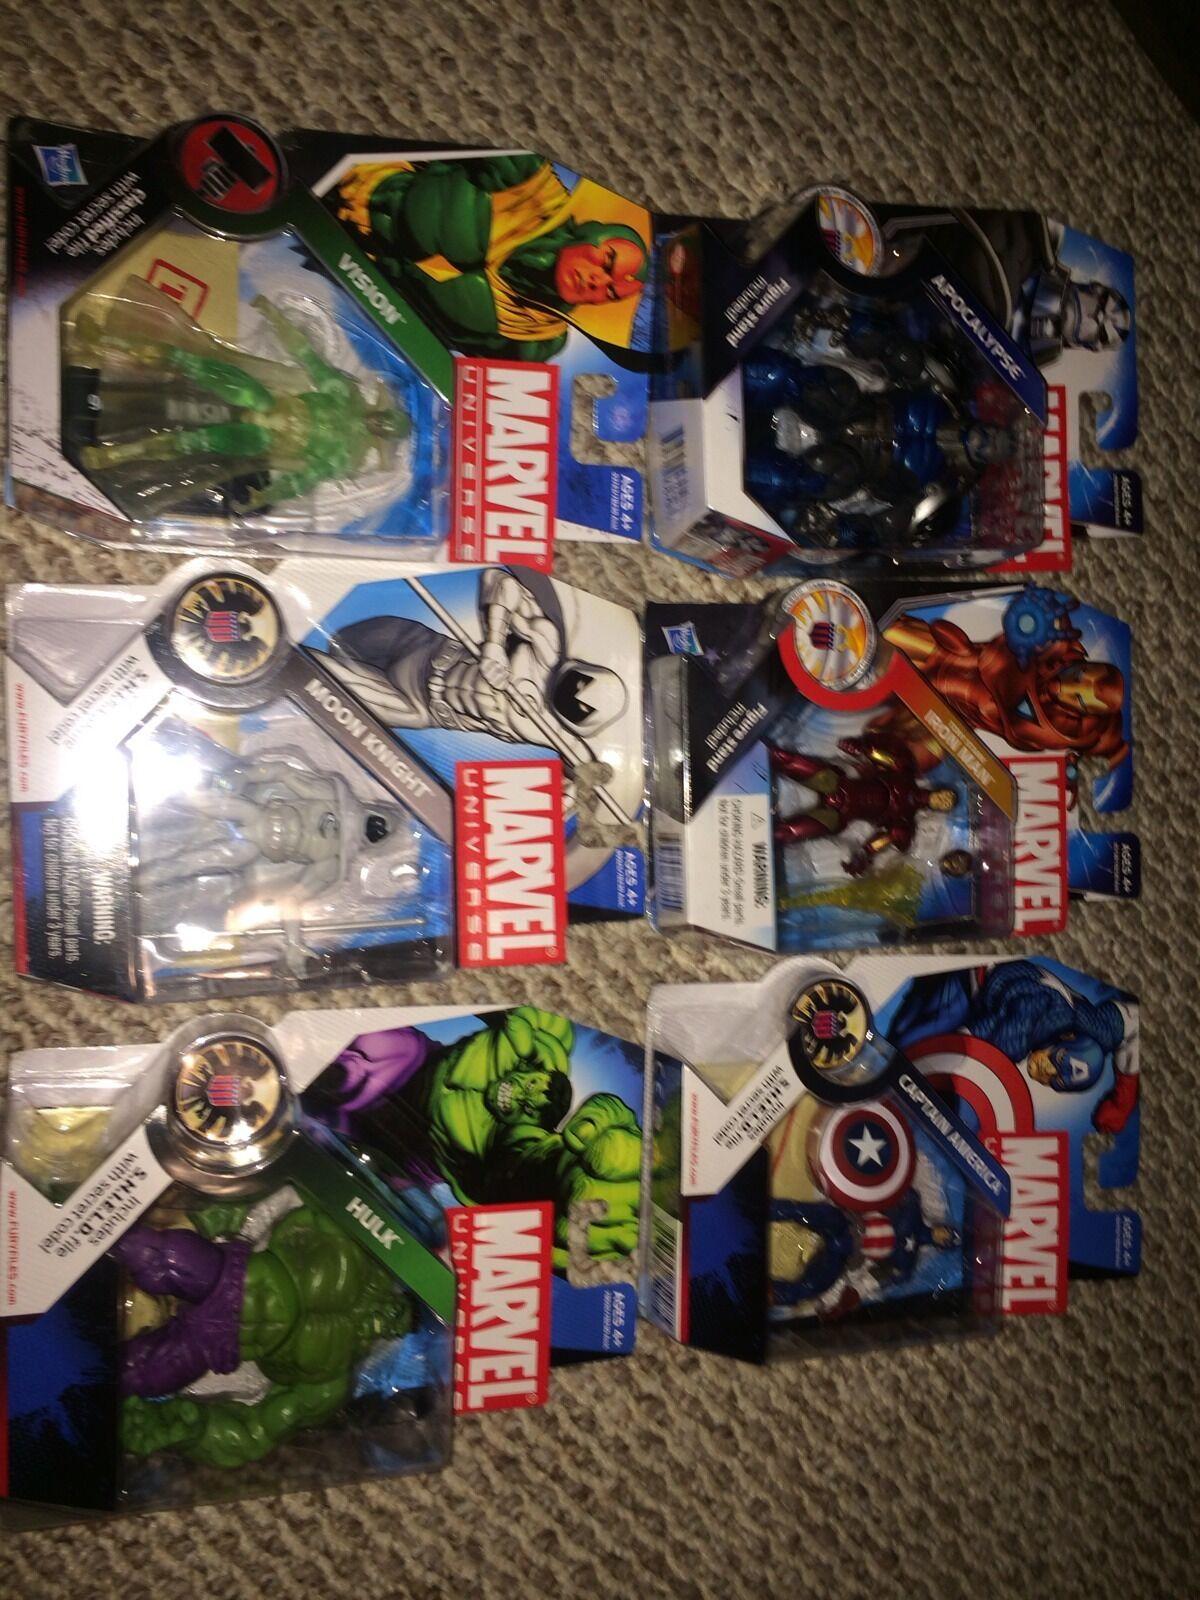 Marvel - apokalypse vision variante mond ritter  captain america  iron man 3